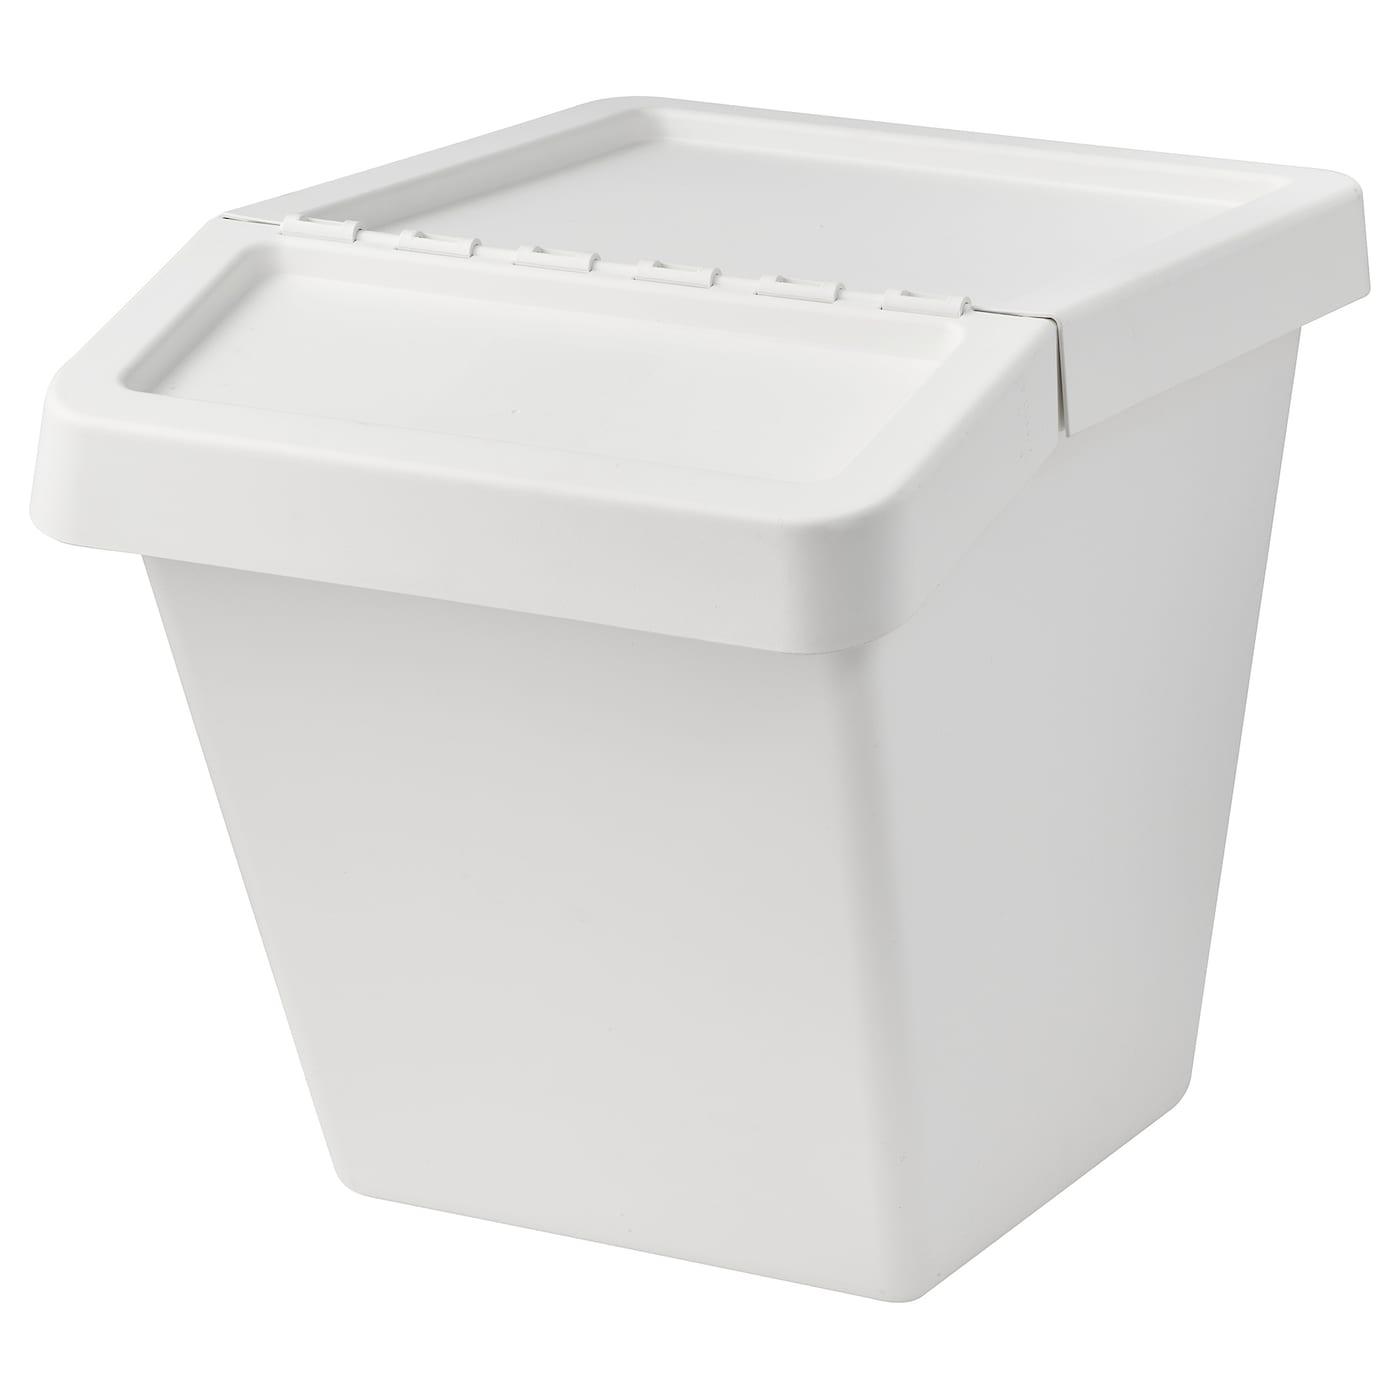 Ikea SORTERA Waste sorting bin with lid, white16 gallon (60 l)